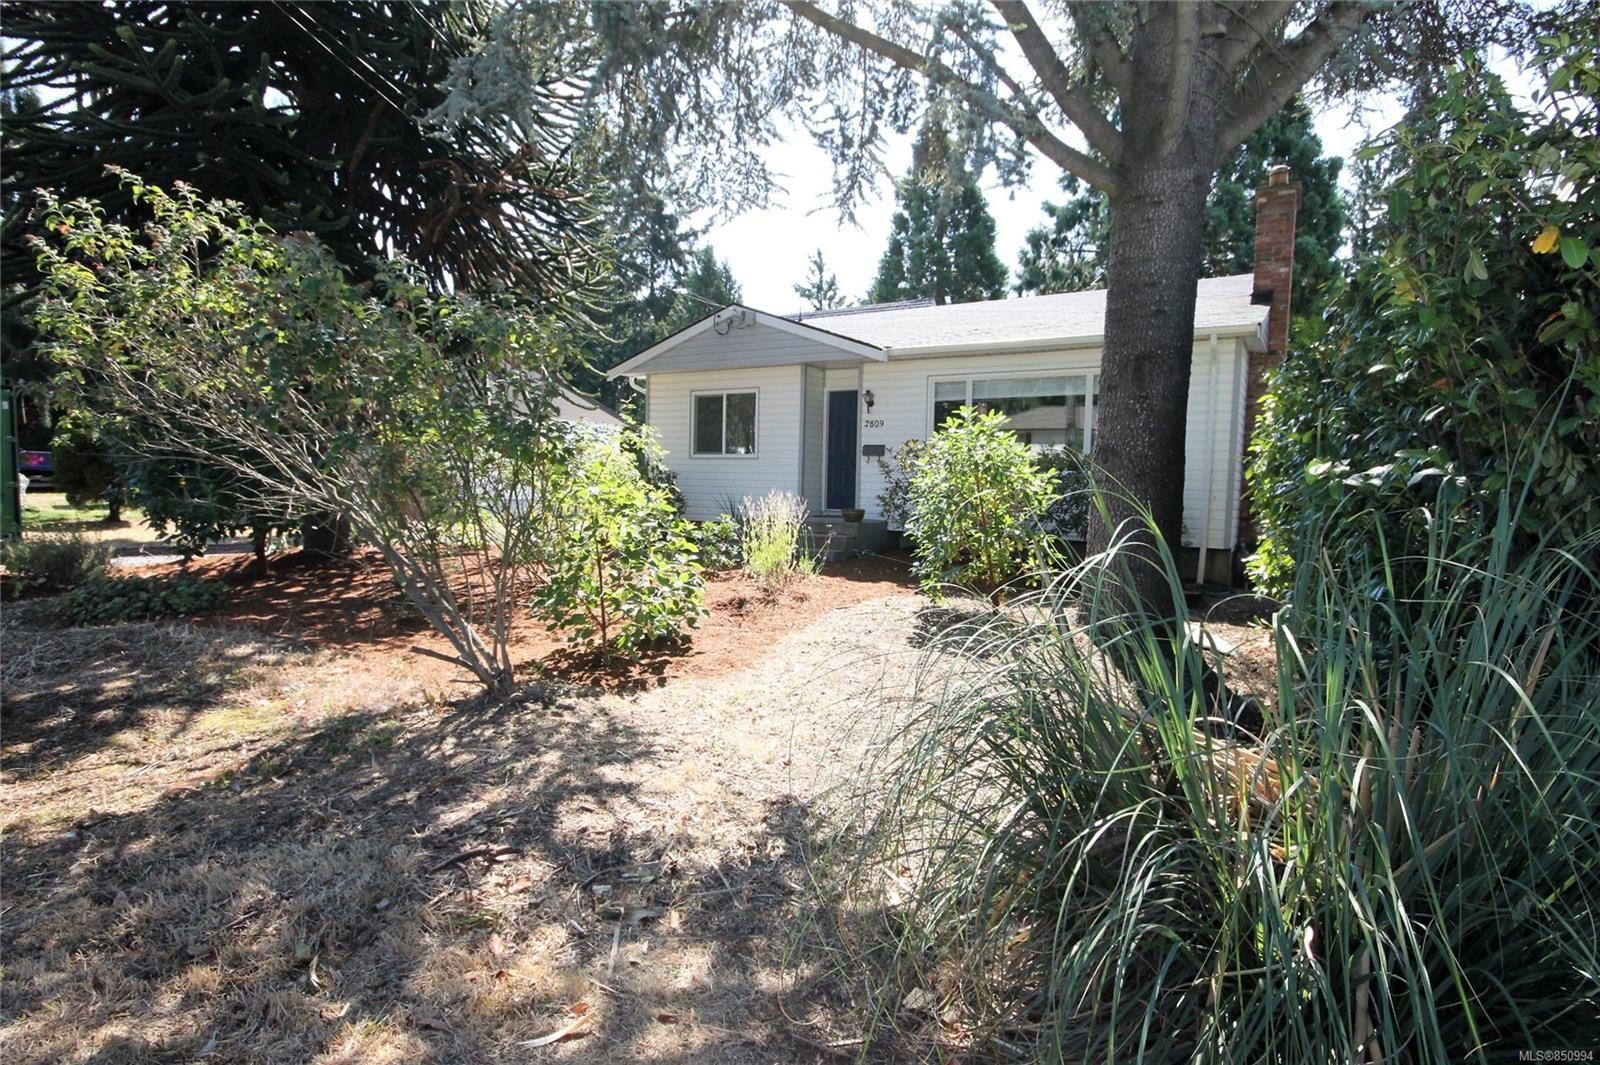 Main Photo: 2809 Sooke Rd in : La Walfred House for sale (Langford)  : MLS®# 850994